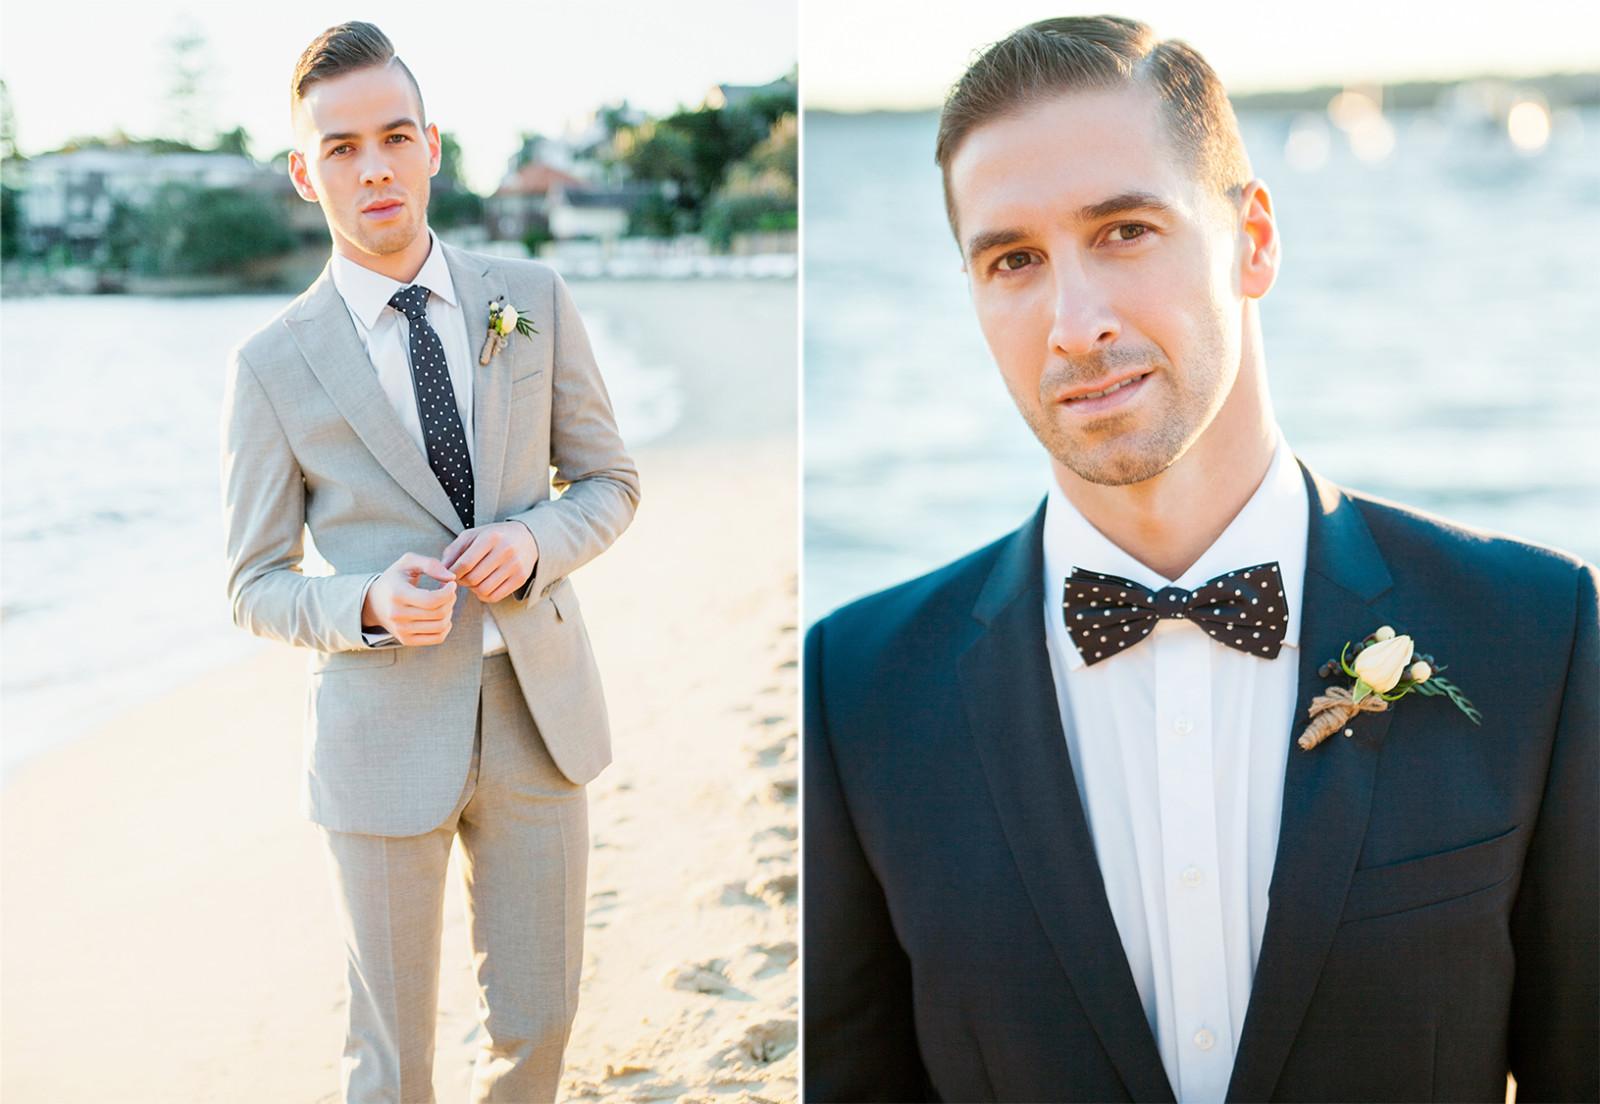 Arno Callum Wink Models